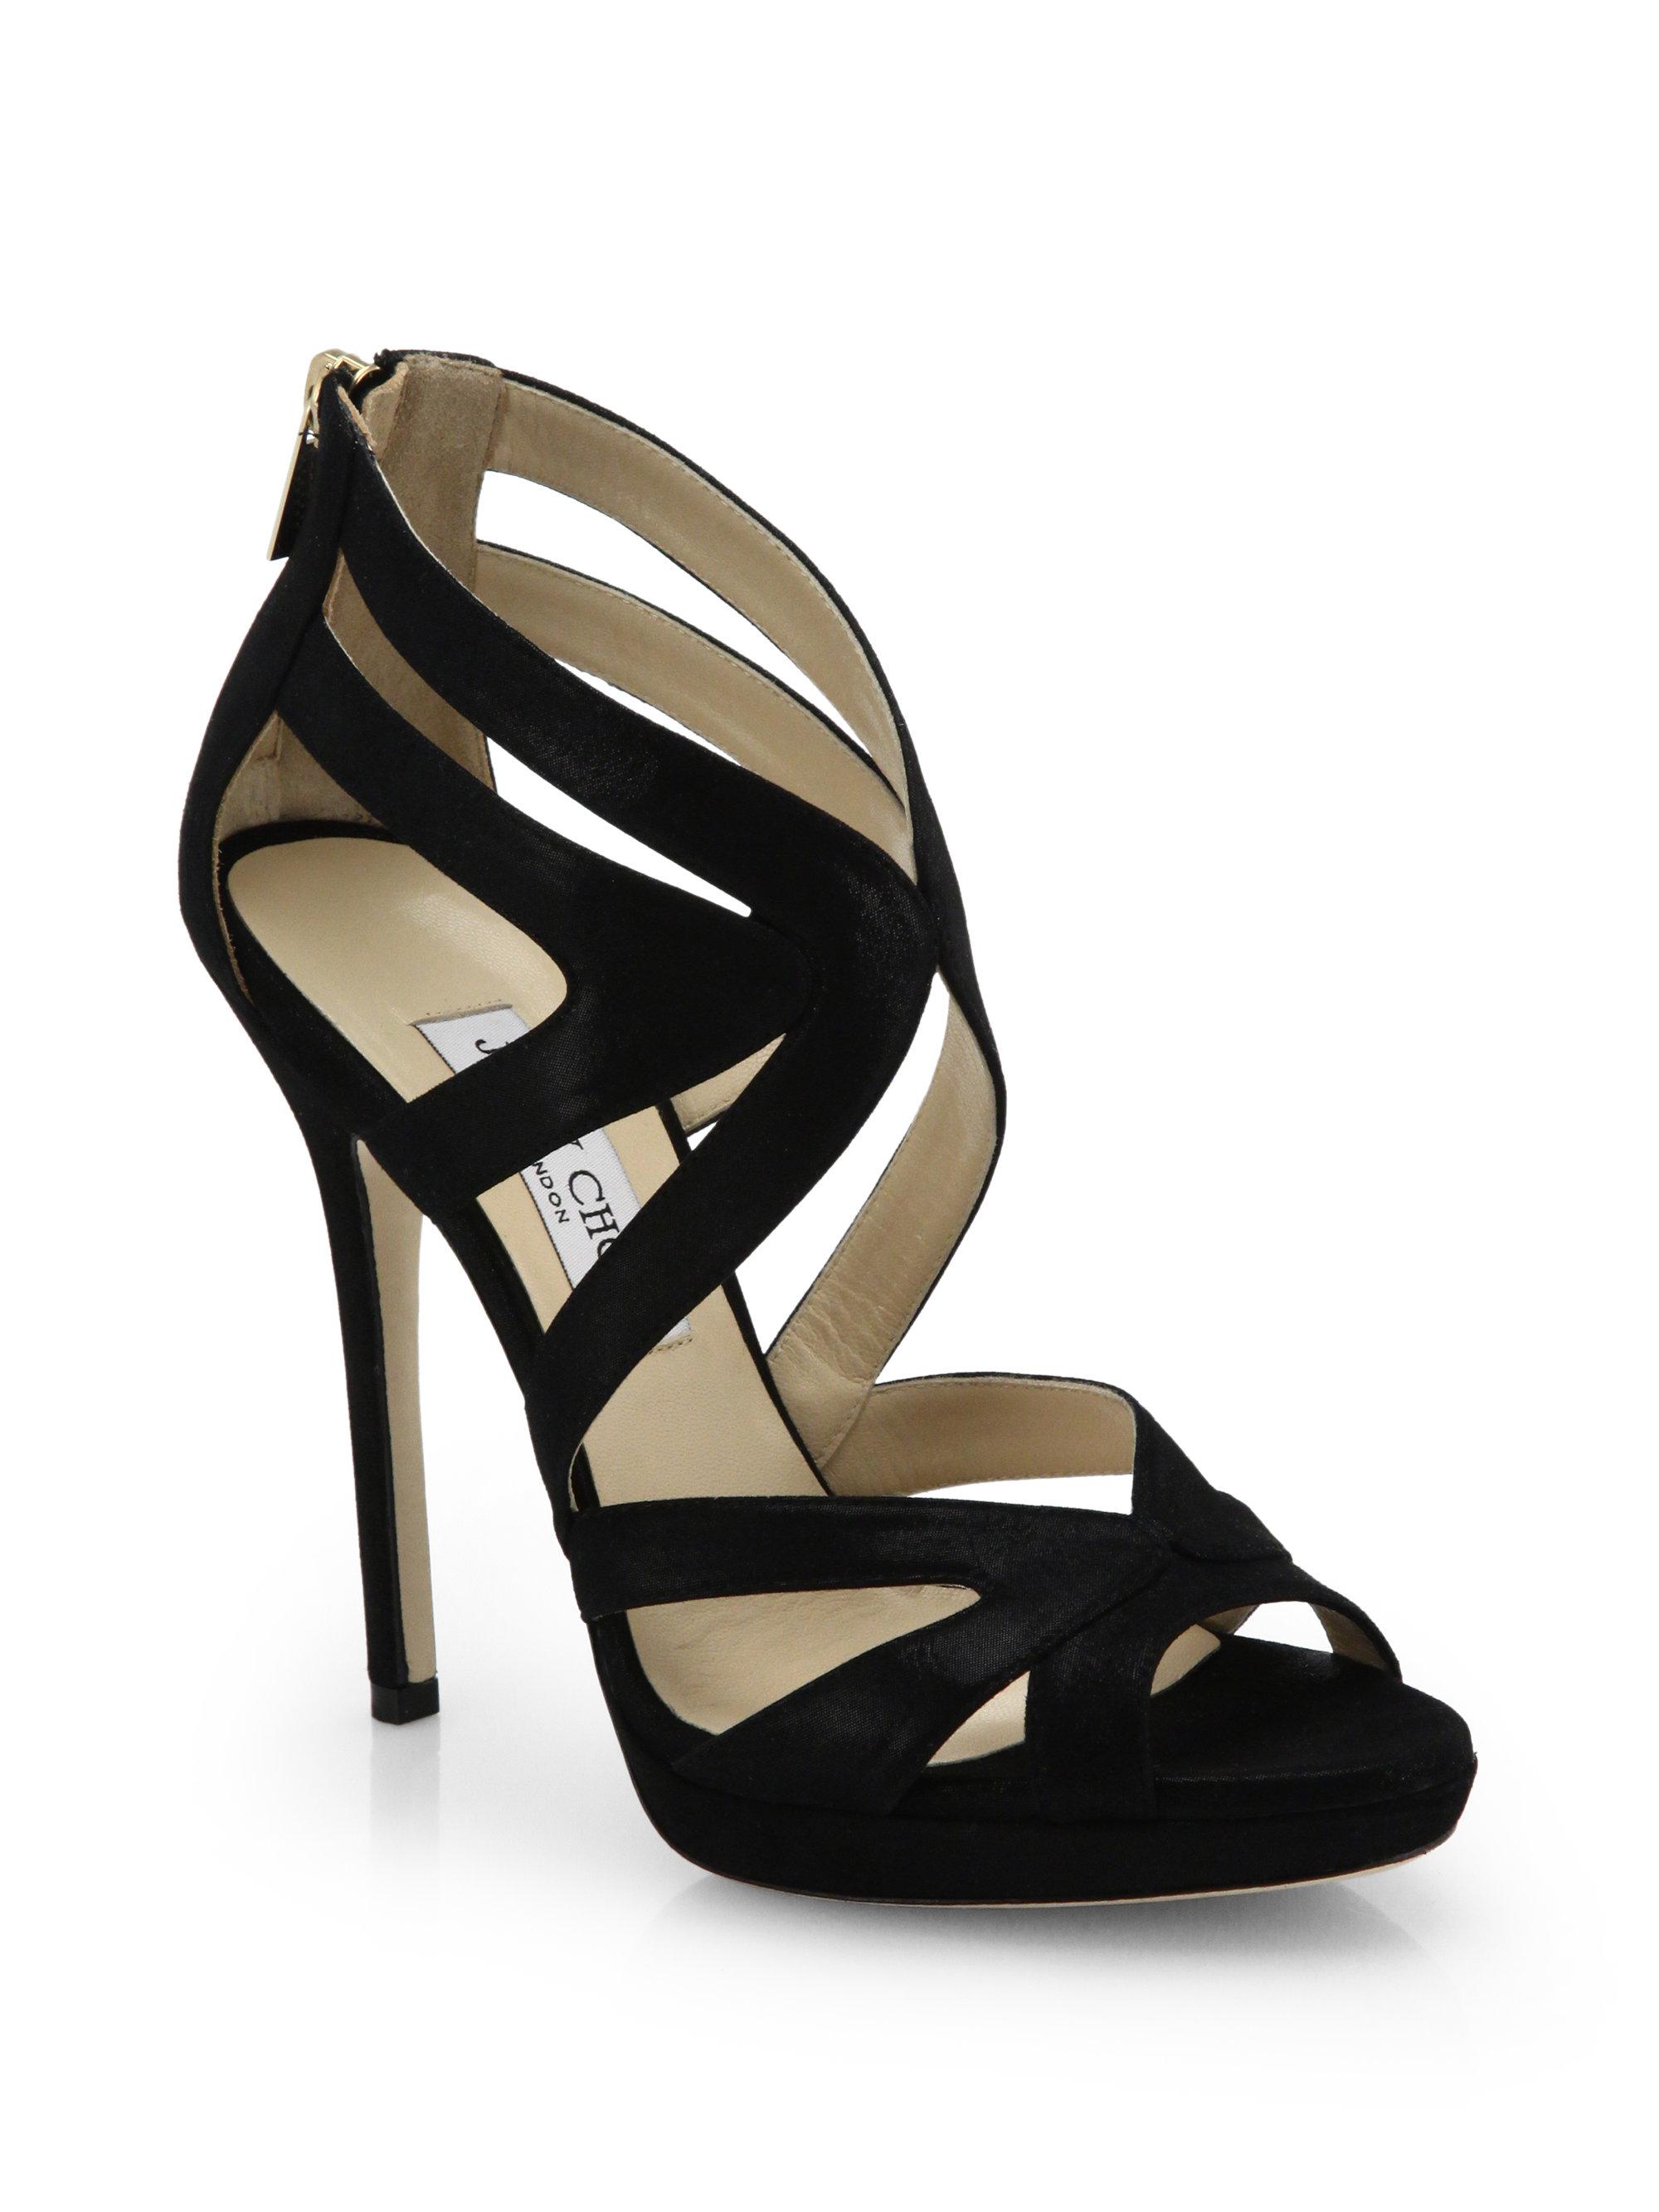 0cb9baef04c Lyst - Jimmy Choo Collar Shimmer Suede Platform Sandals in Black